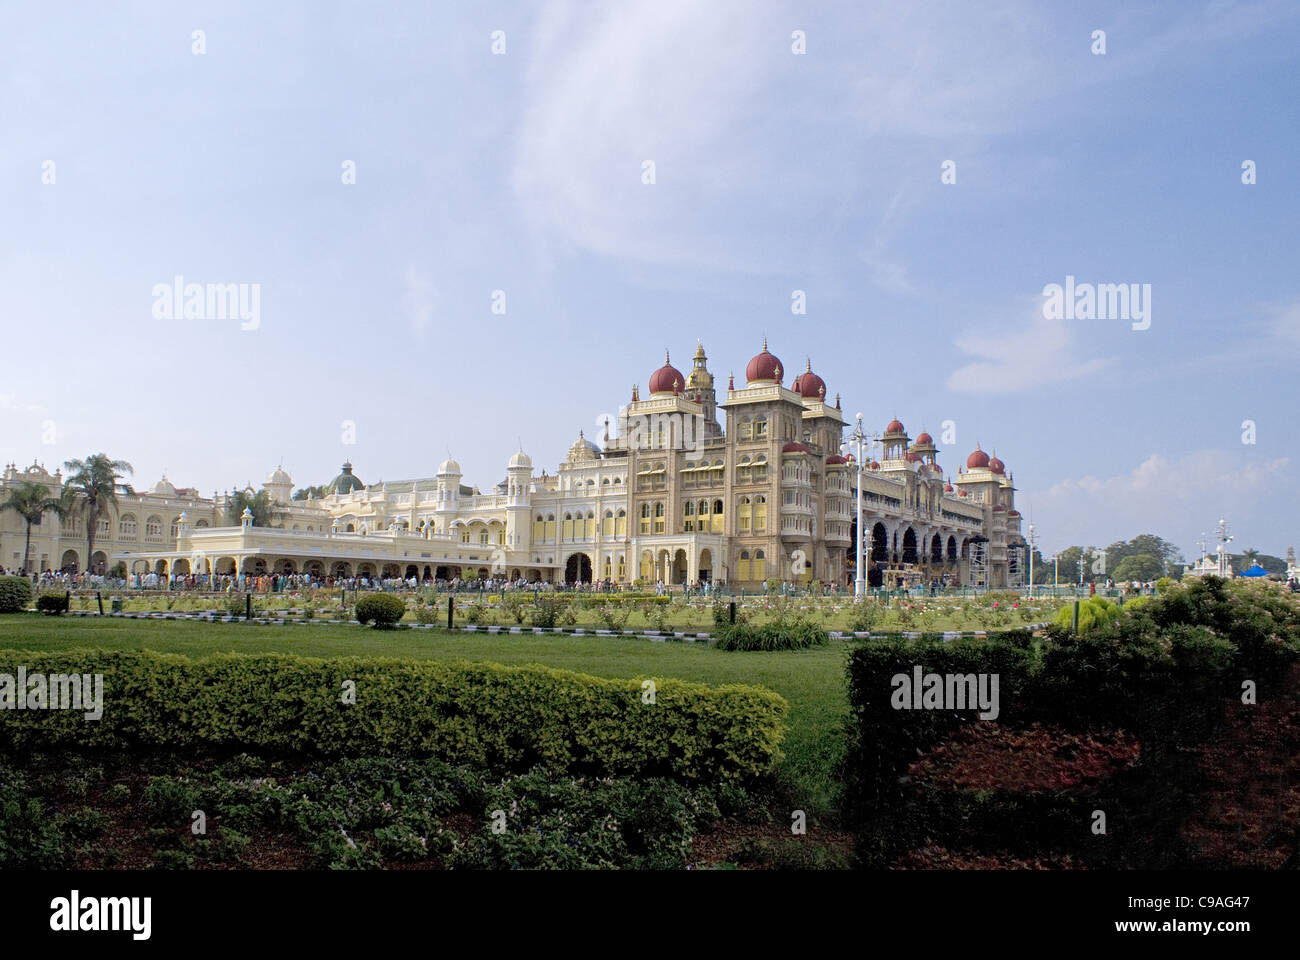 The Palace of Mysore, Mysore, Karnataka India. Long Shot. Official residence of the Wodeyars — rulers of Mysore - Stock Image